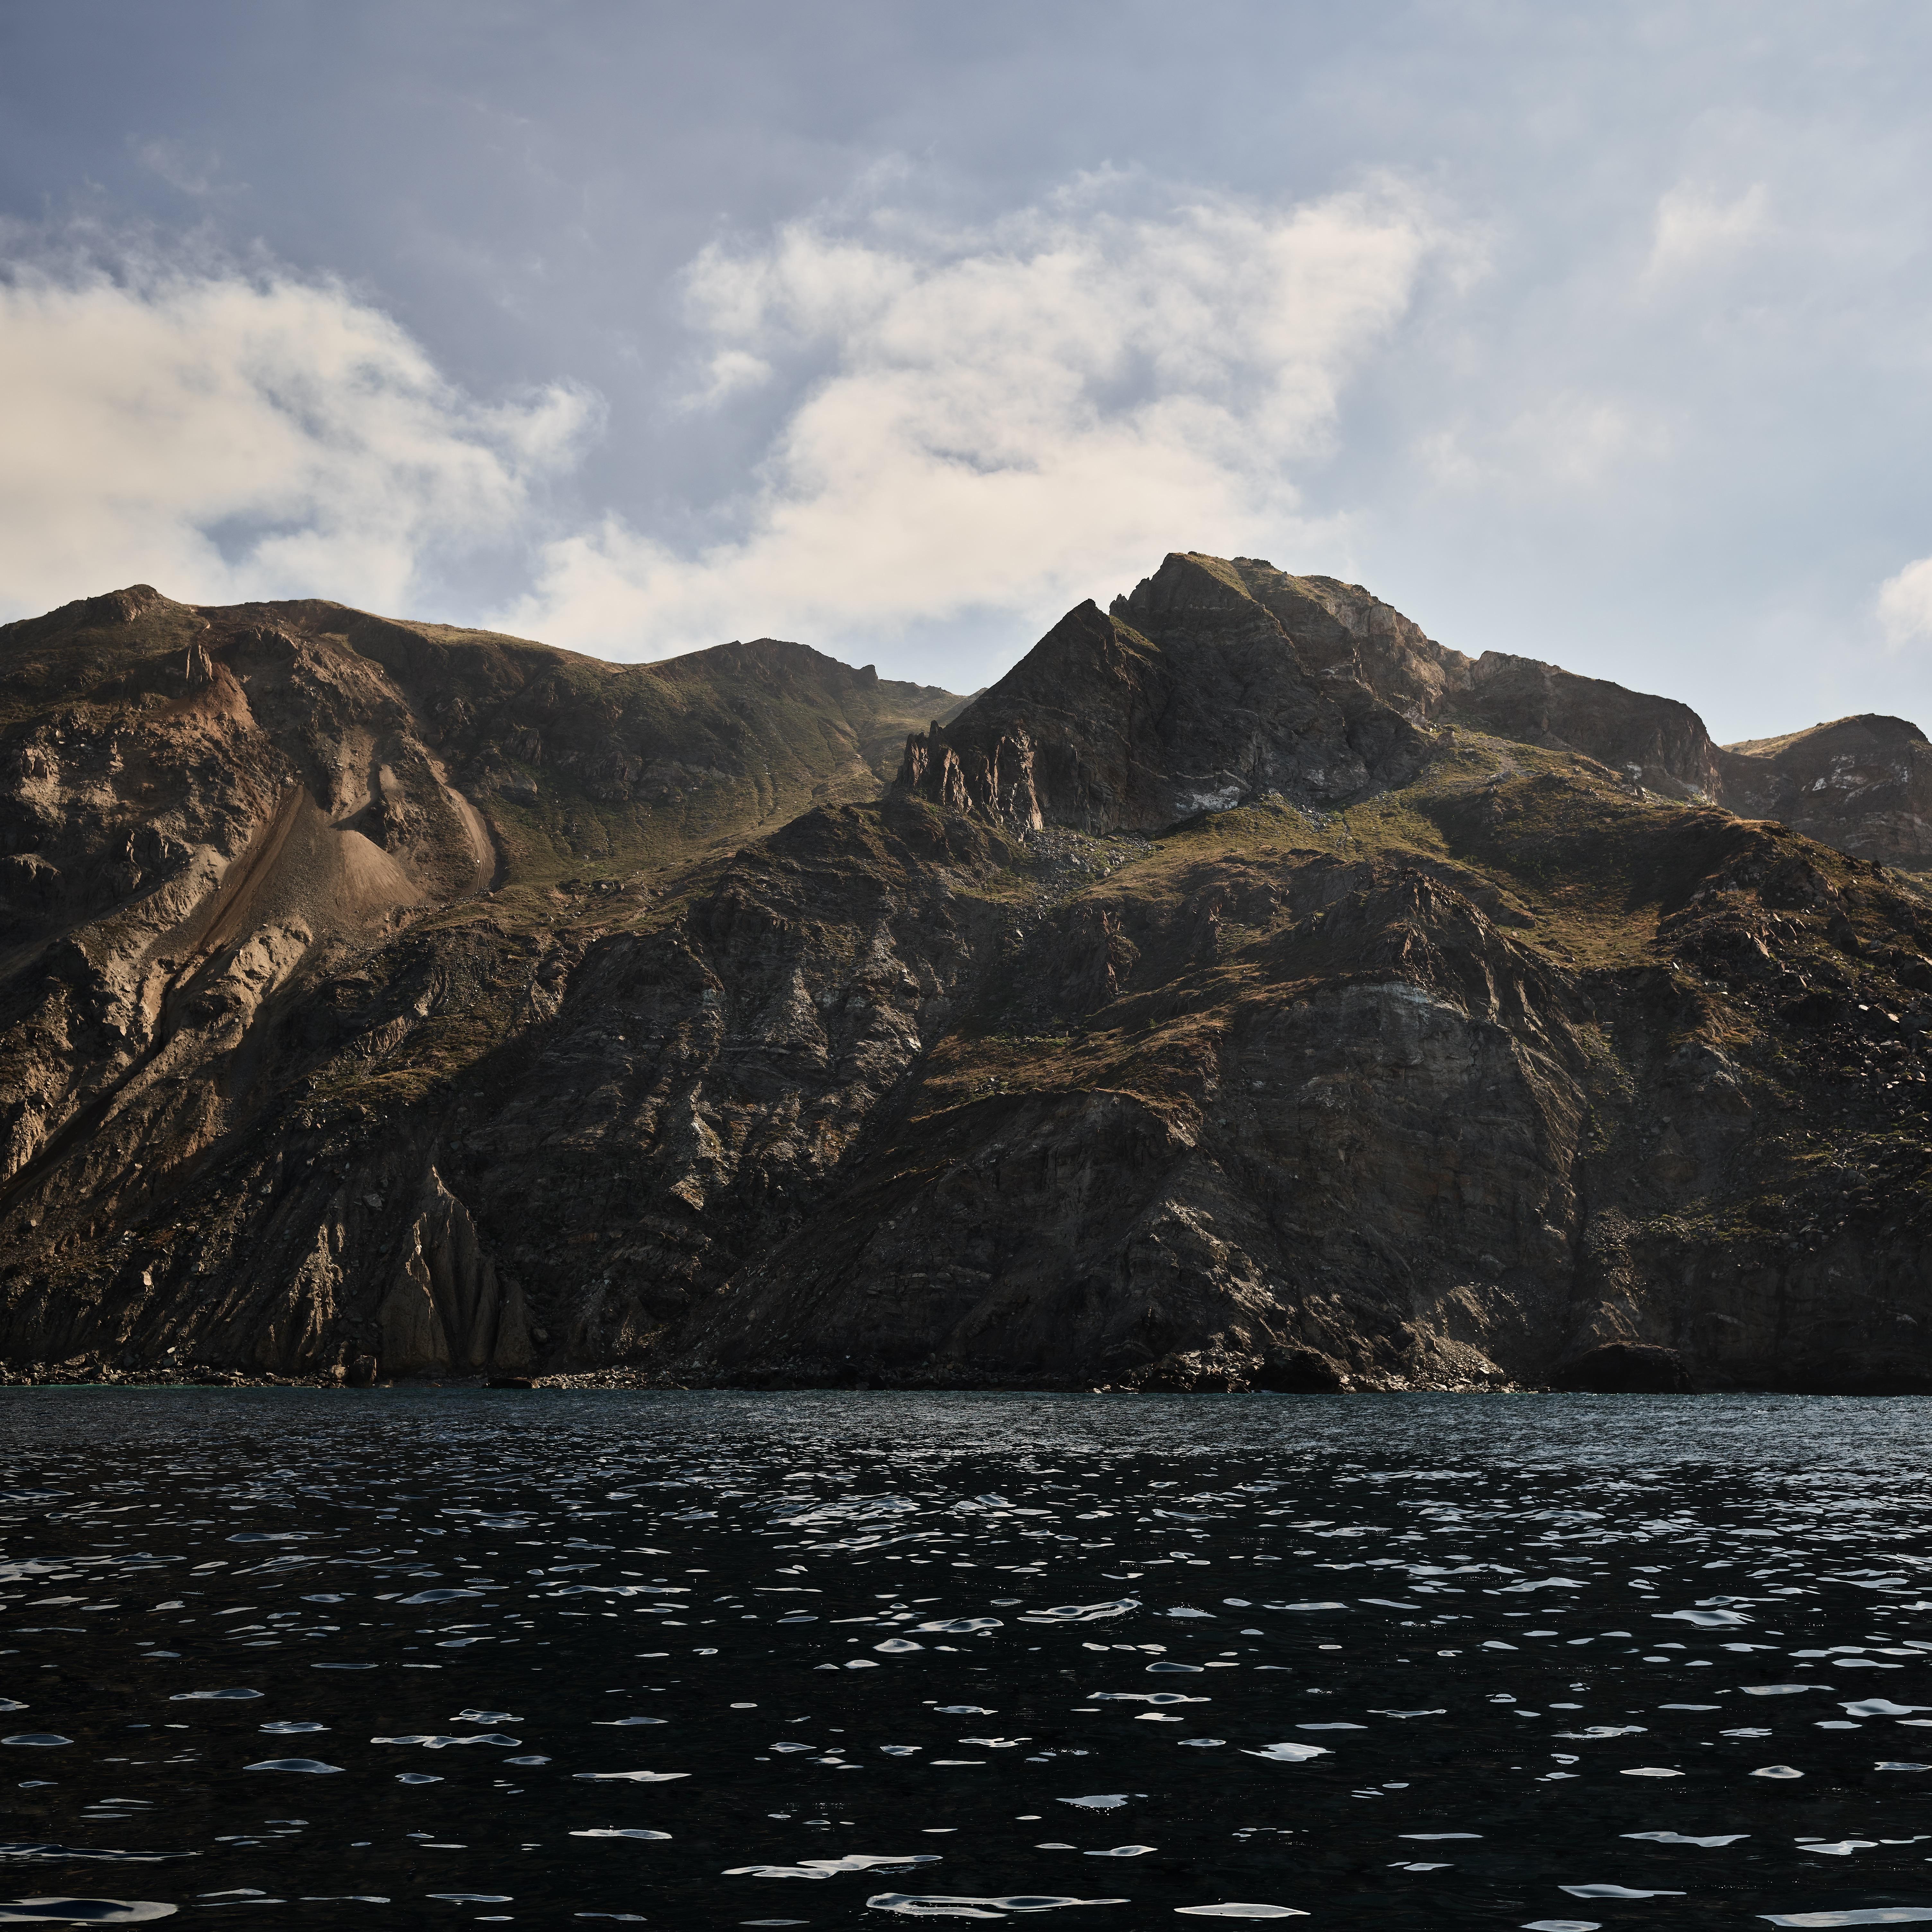 Download 7 New Beautiful Catalina Desktop Wallpapers For